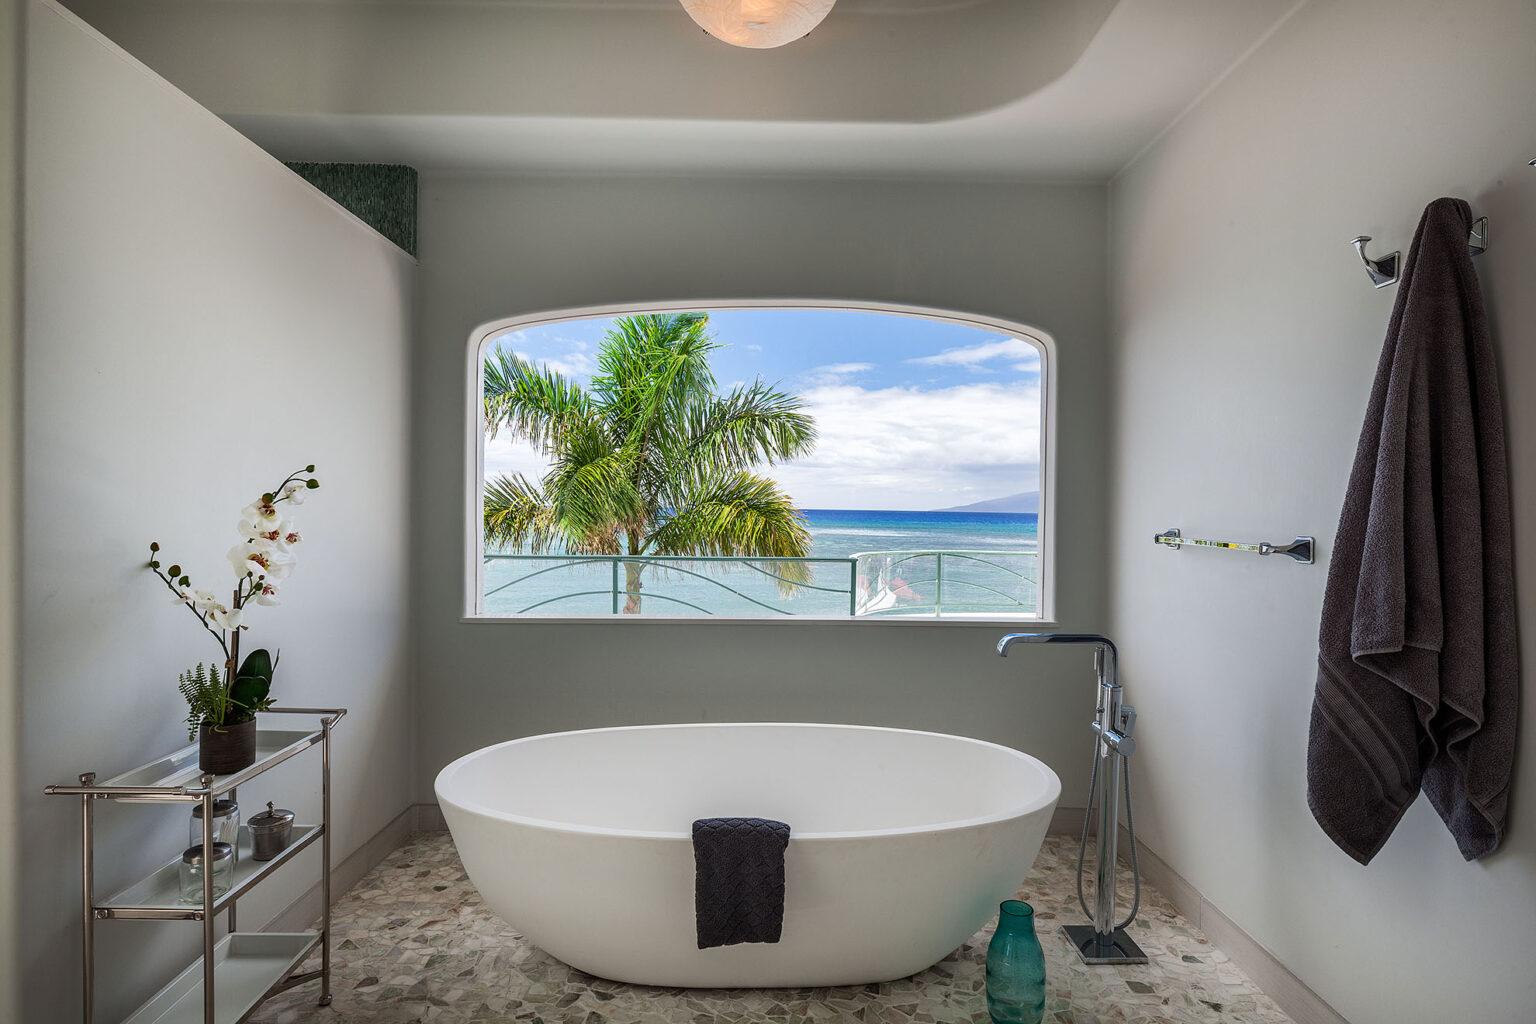 luxury-real-estate-photo-by-panaviz-bath